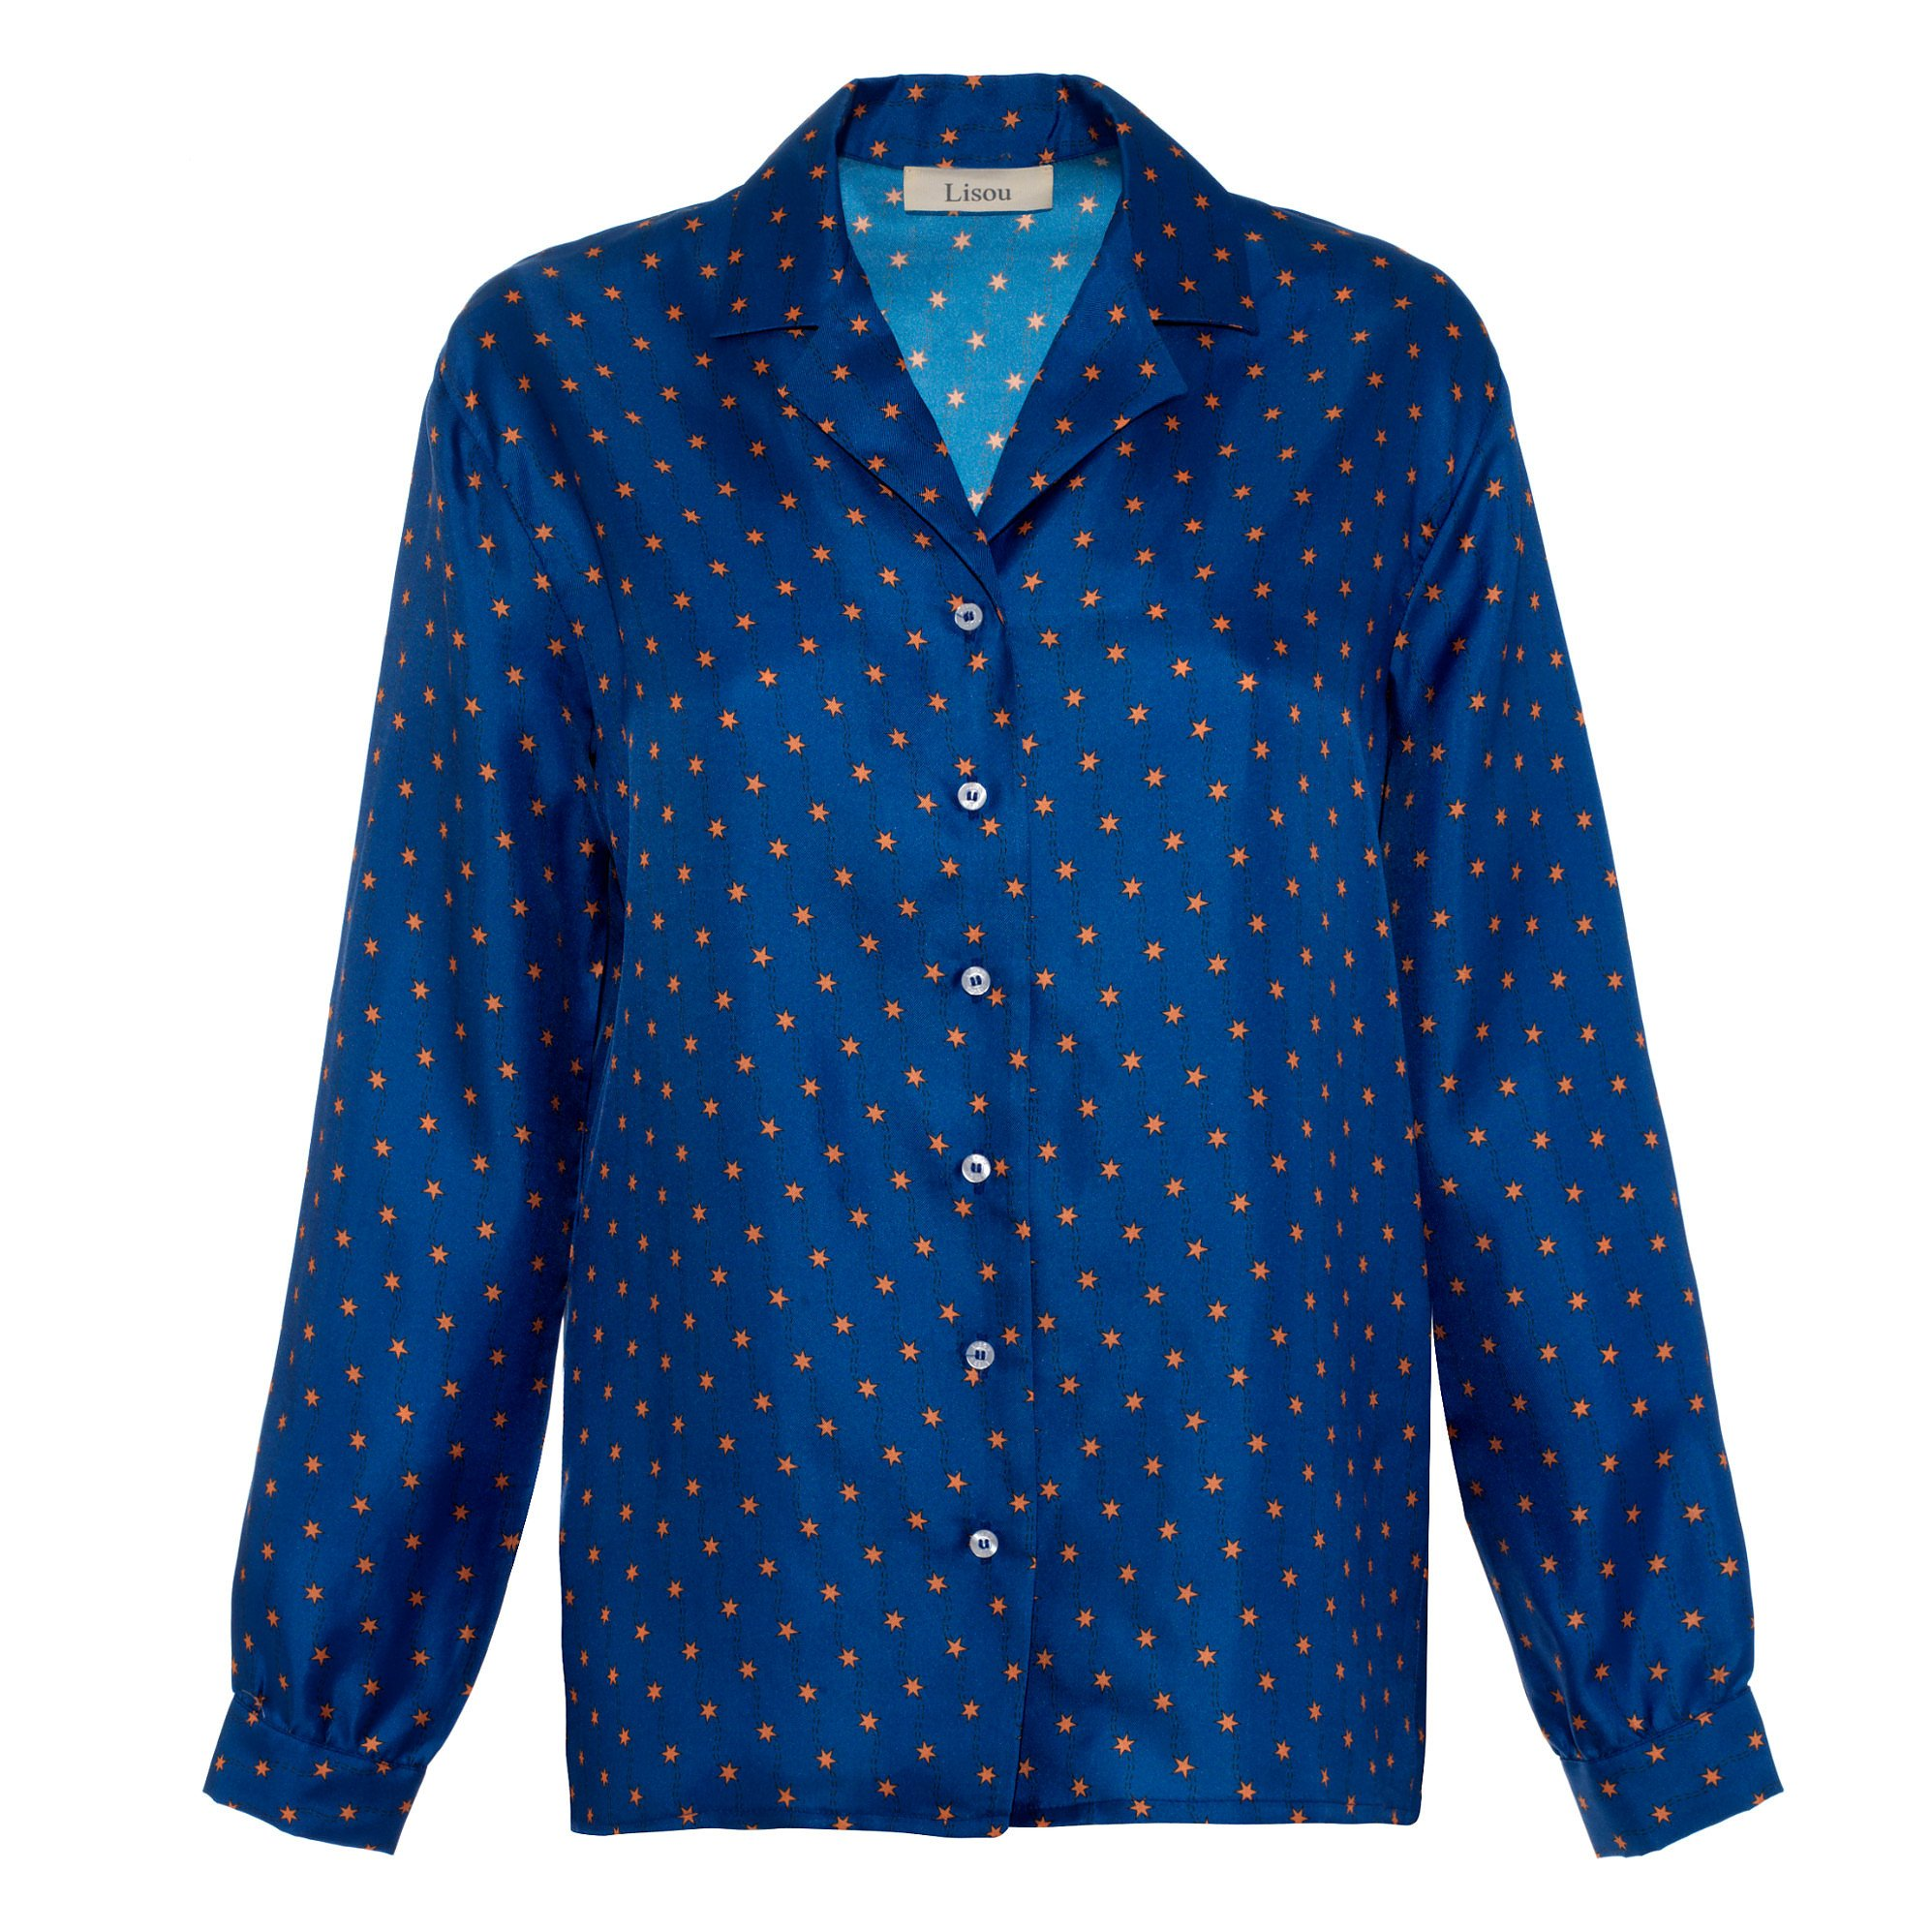 Lisou Solange Star Print Shirt